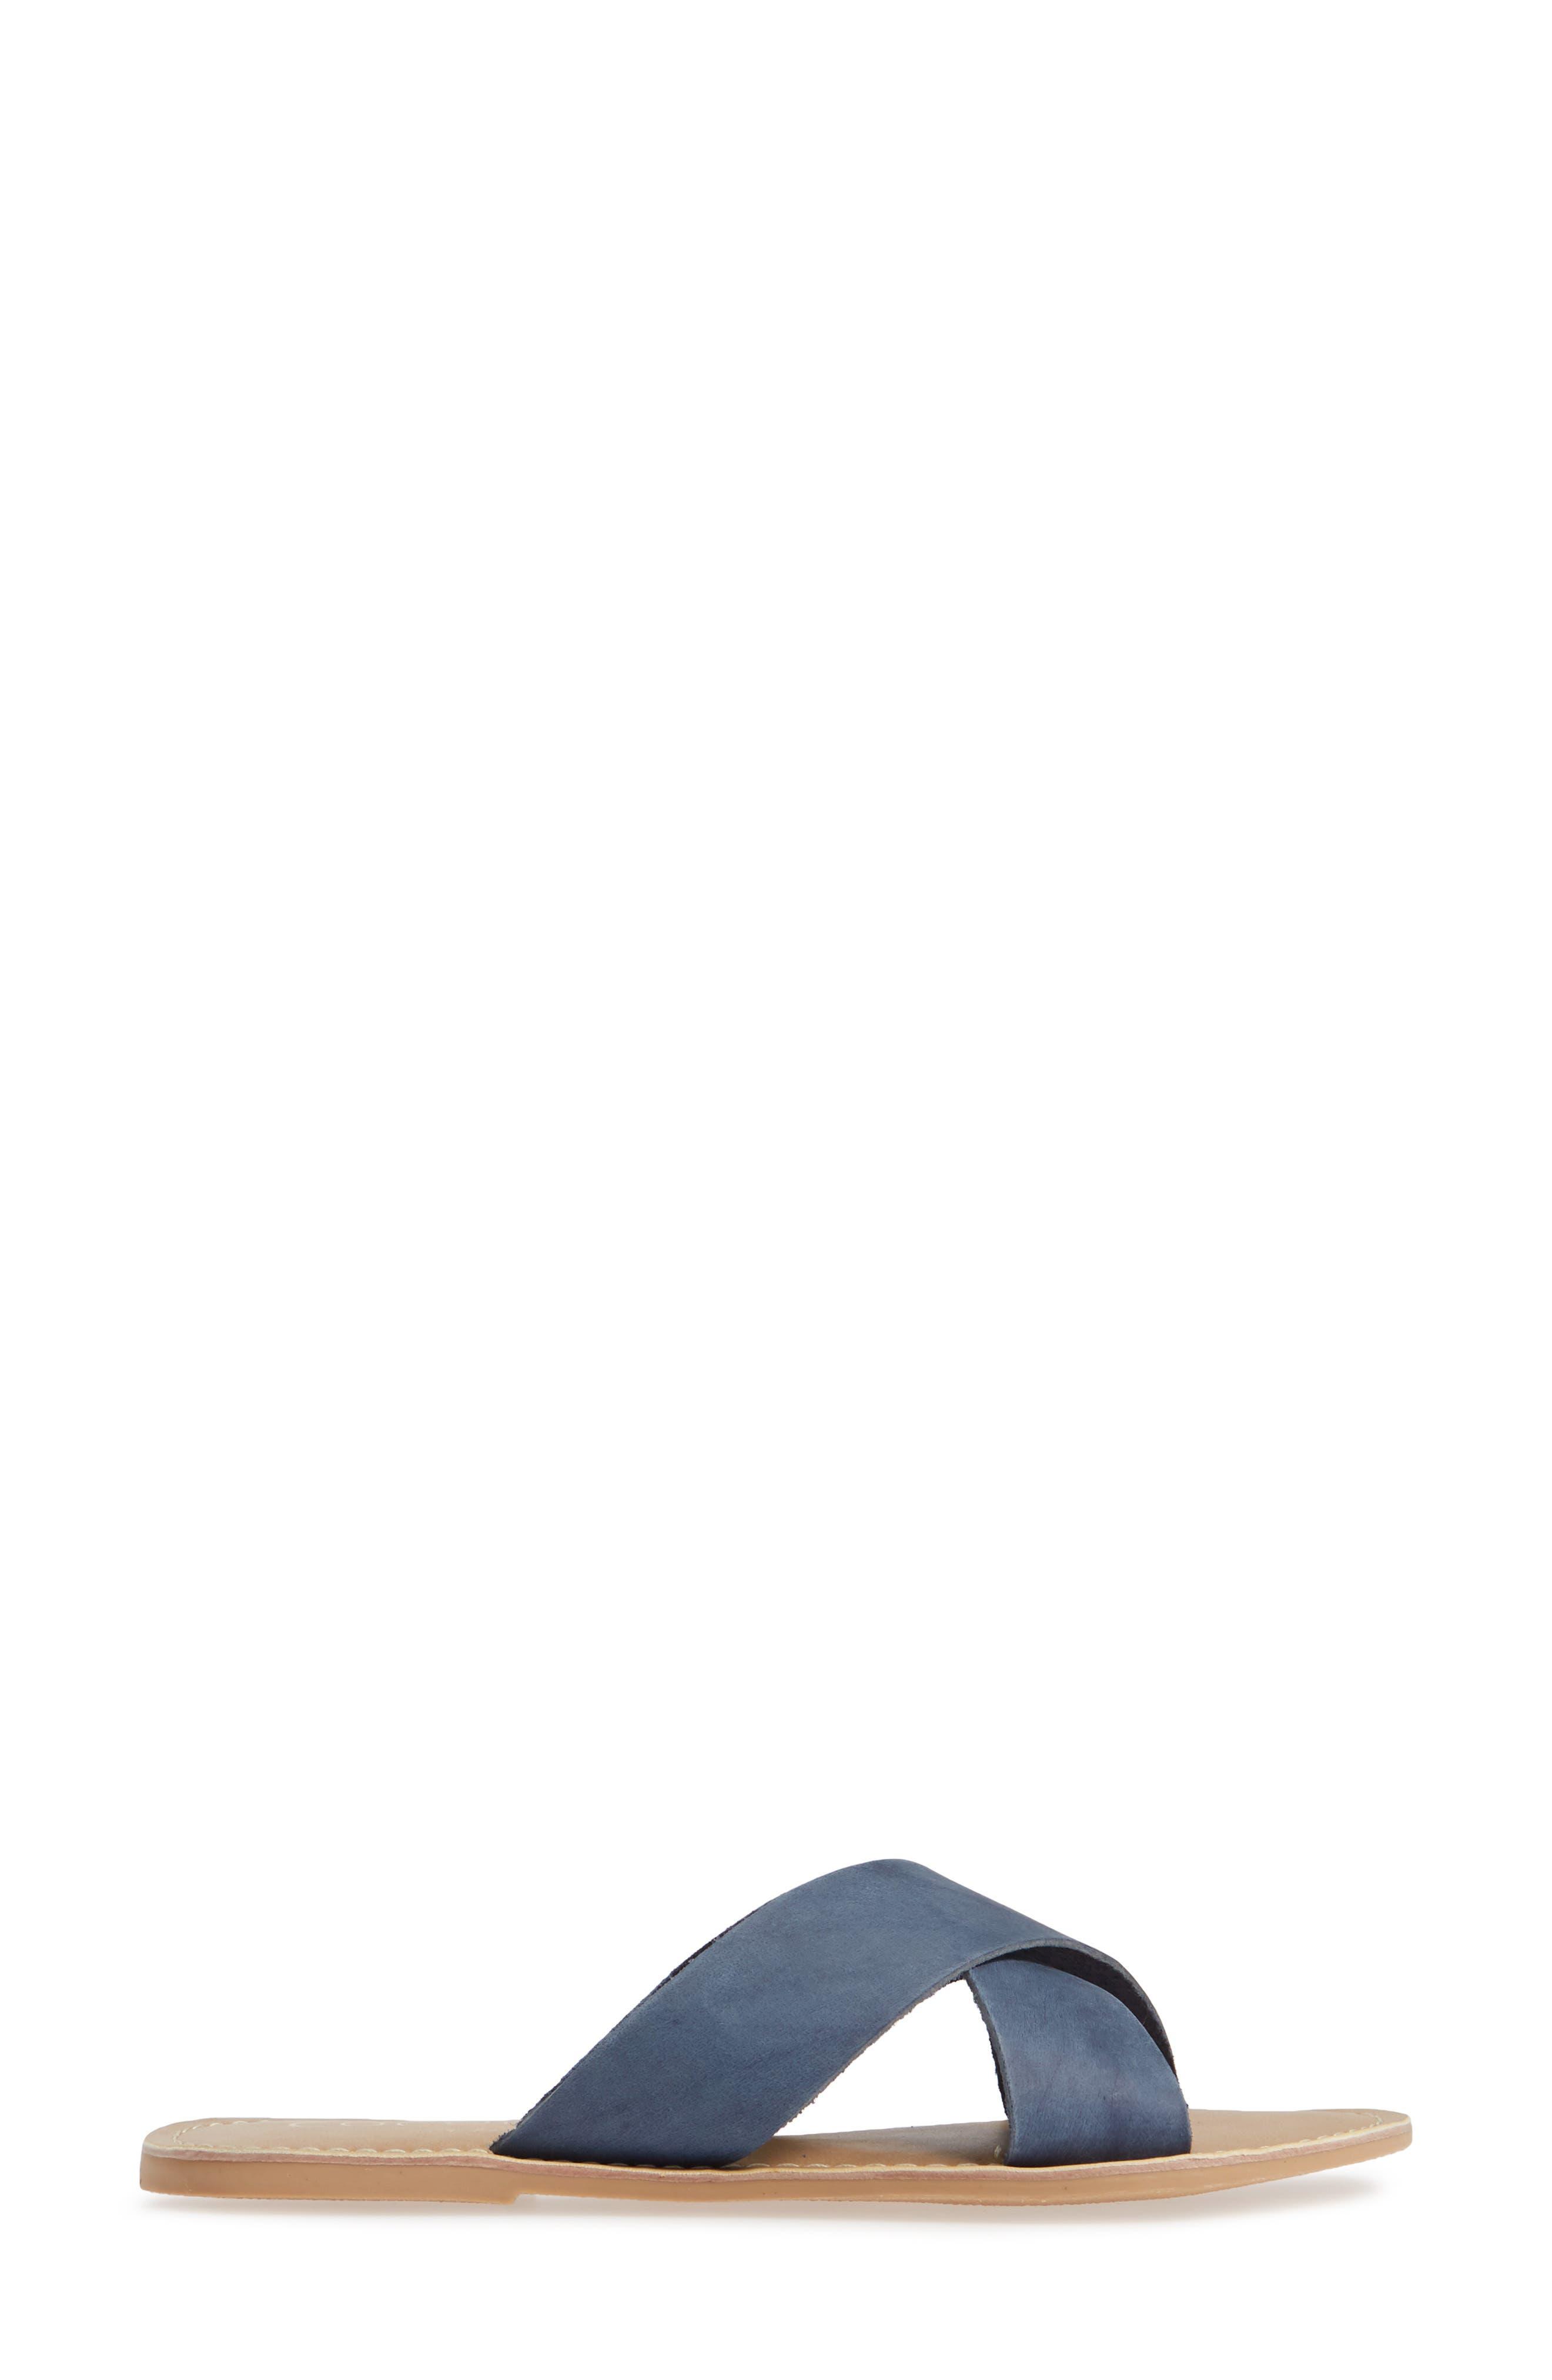 COCONUTS BY MATISSE, Pebble Slide Sandal, Alternate thumbnail 3, color, BLUE NUBUCK LEATHER